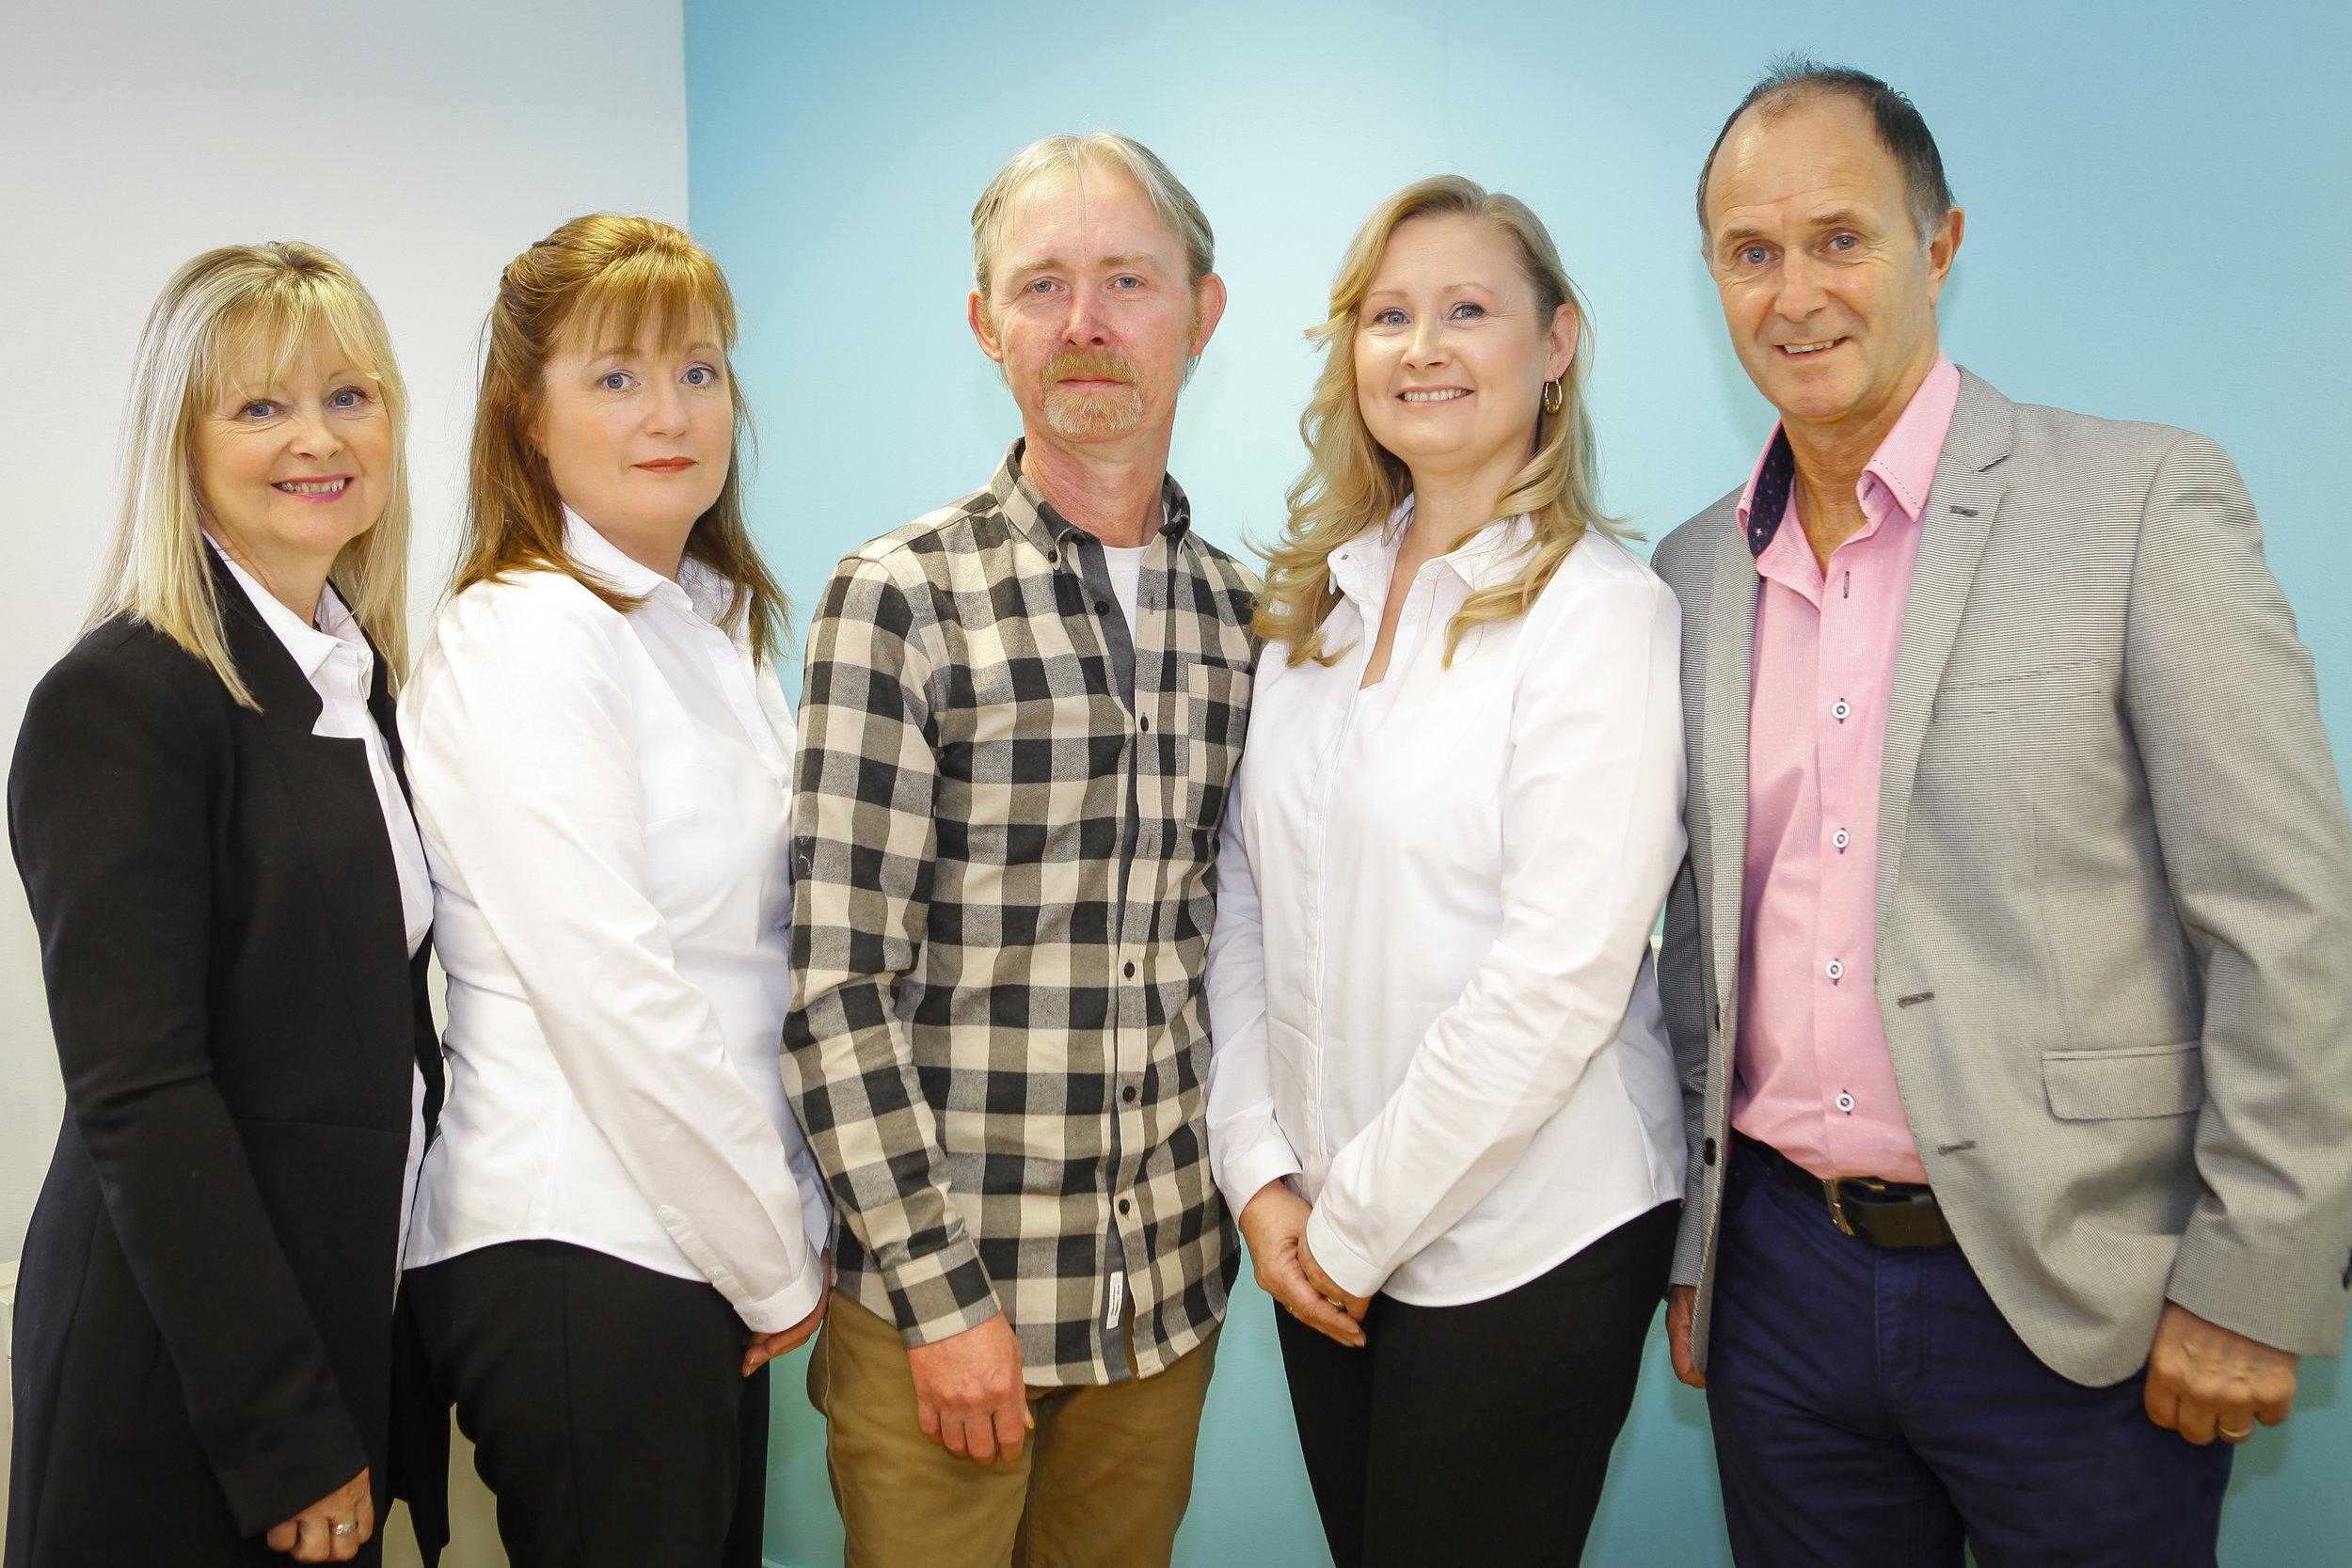 L - R Veronica, Teresa, Ray, Joan & Derek - The Waverley Academy